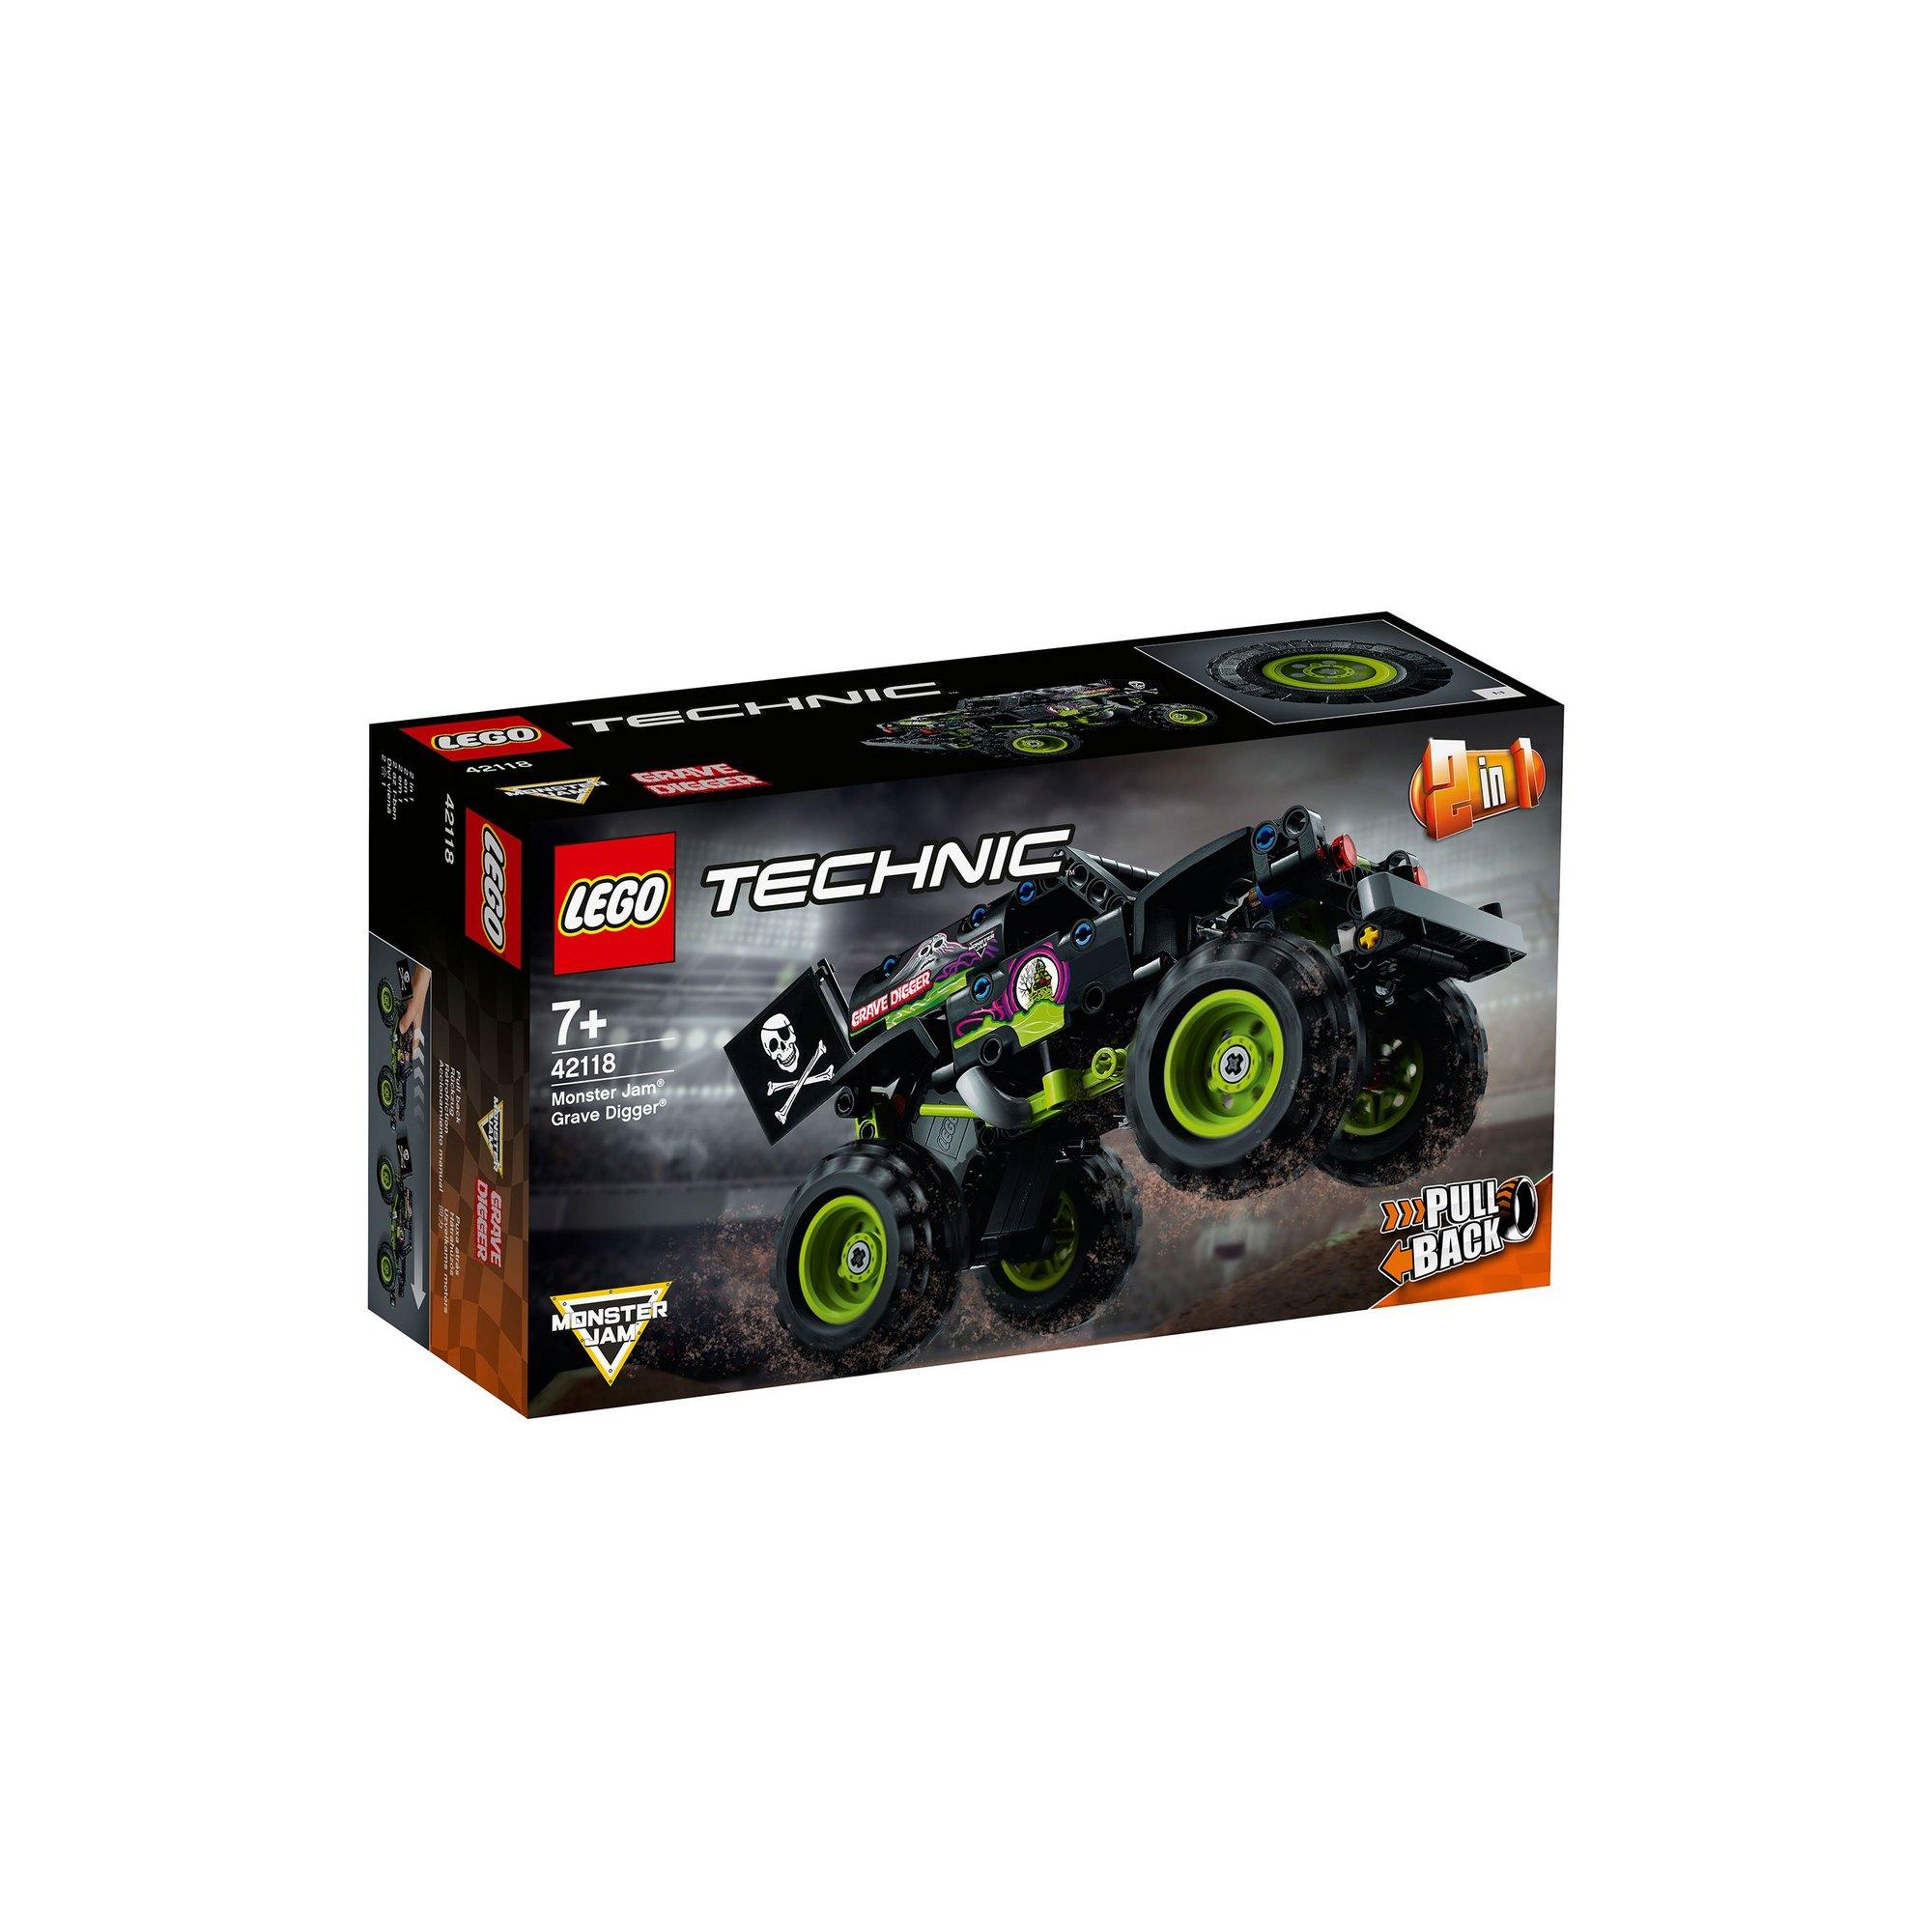 Image of LEGO Technic Monster Jam Grave Digger